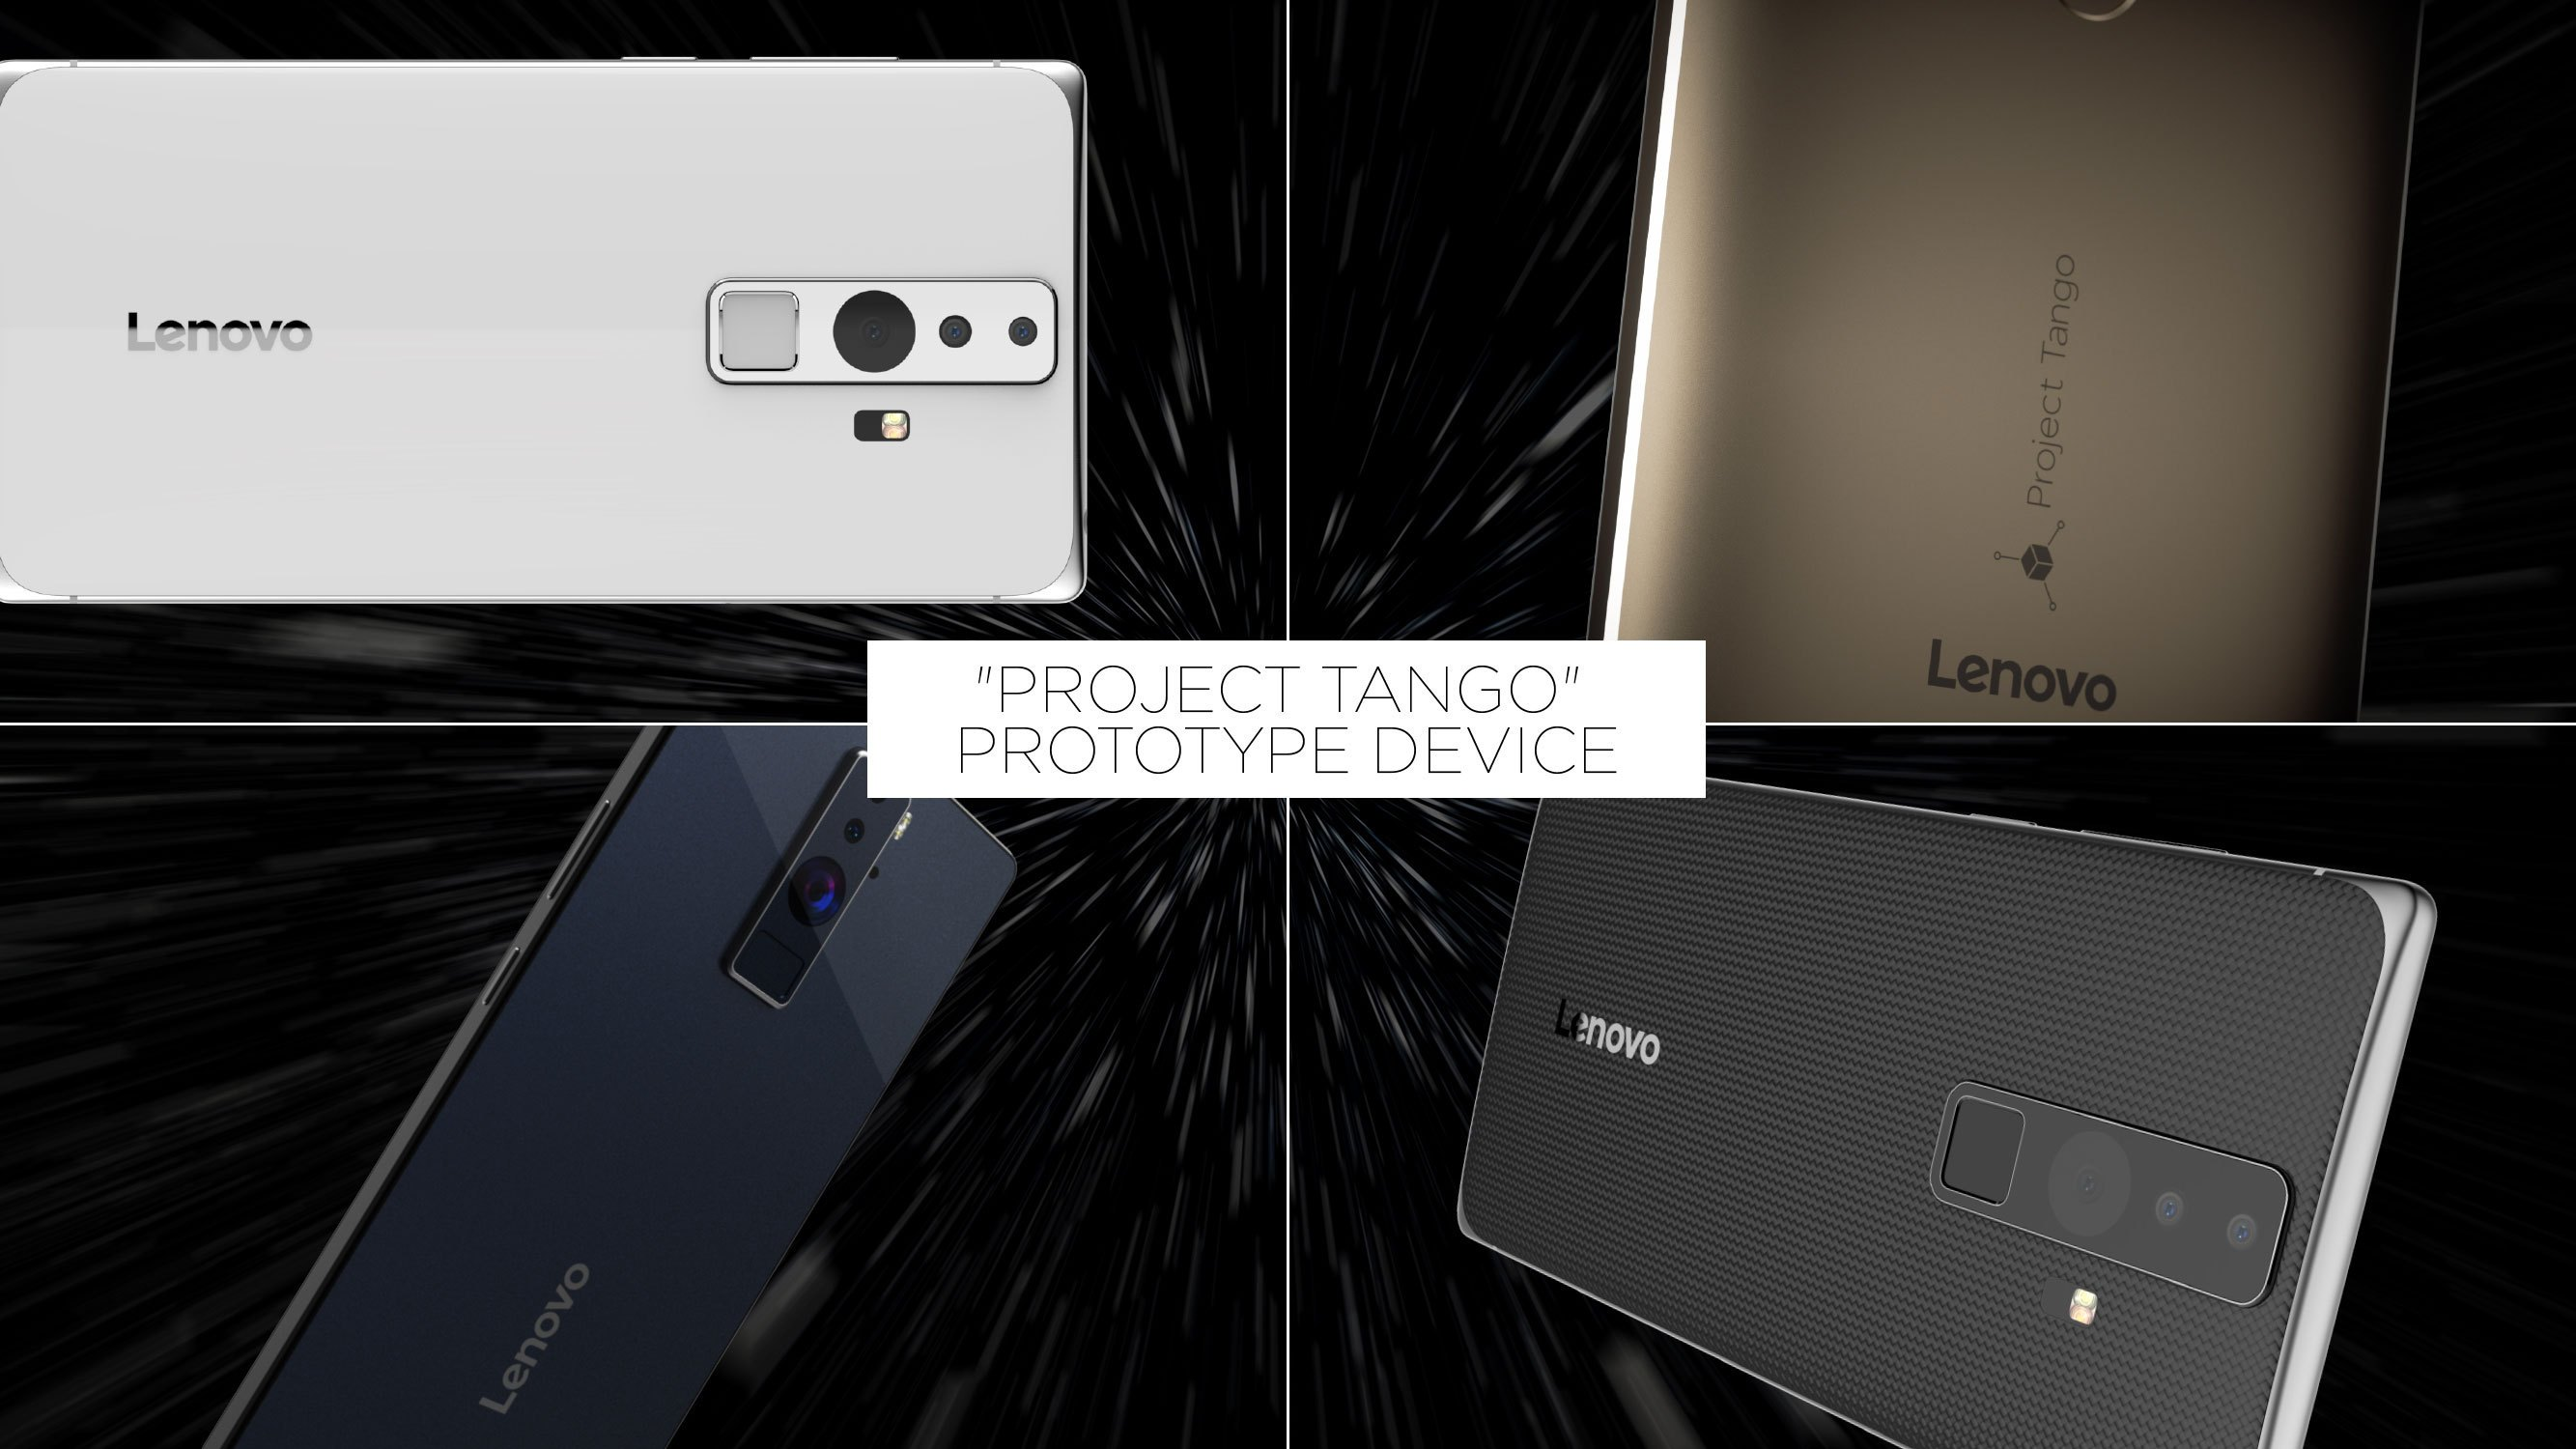 CES 2016 : Le premier smartphone Projet Tango sera signé Lenovo